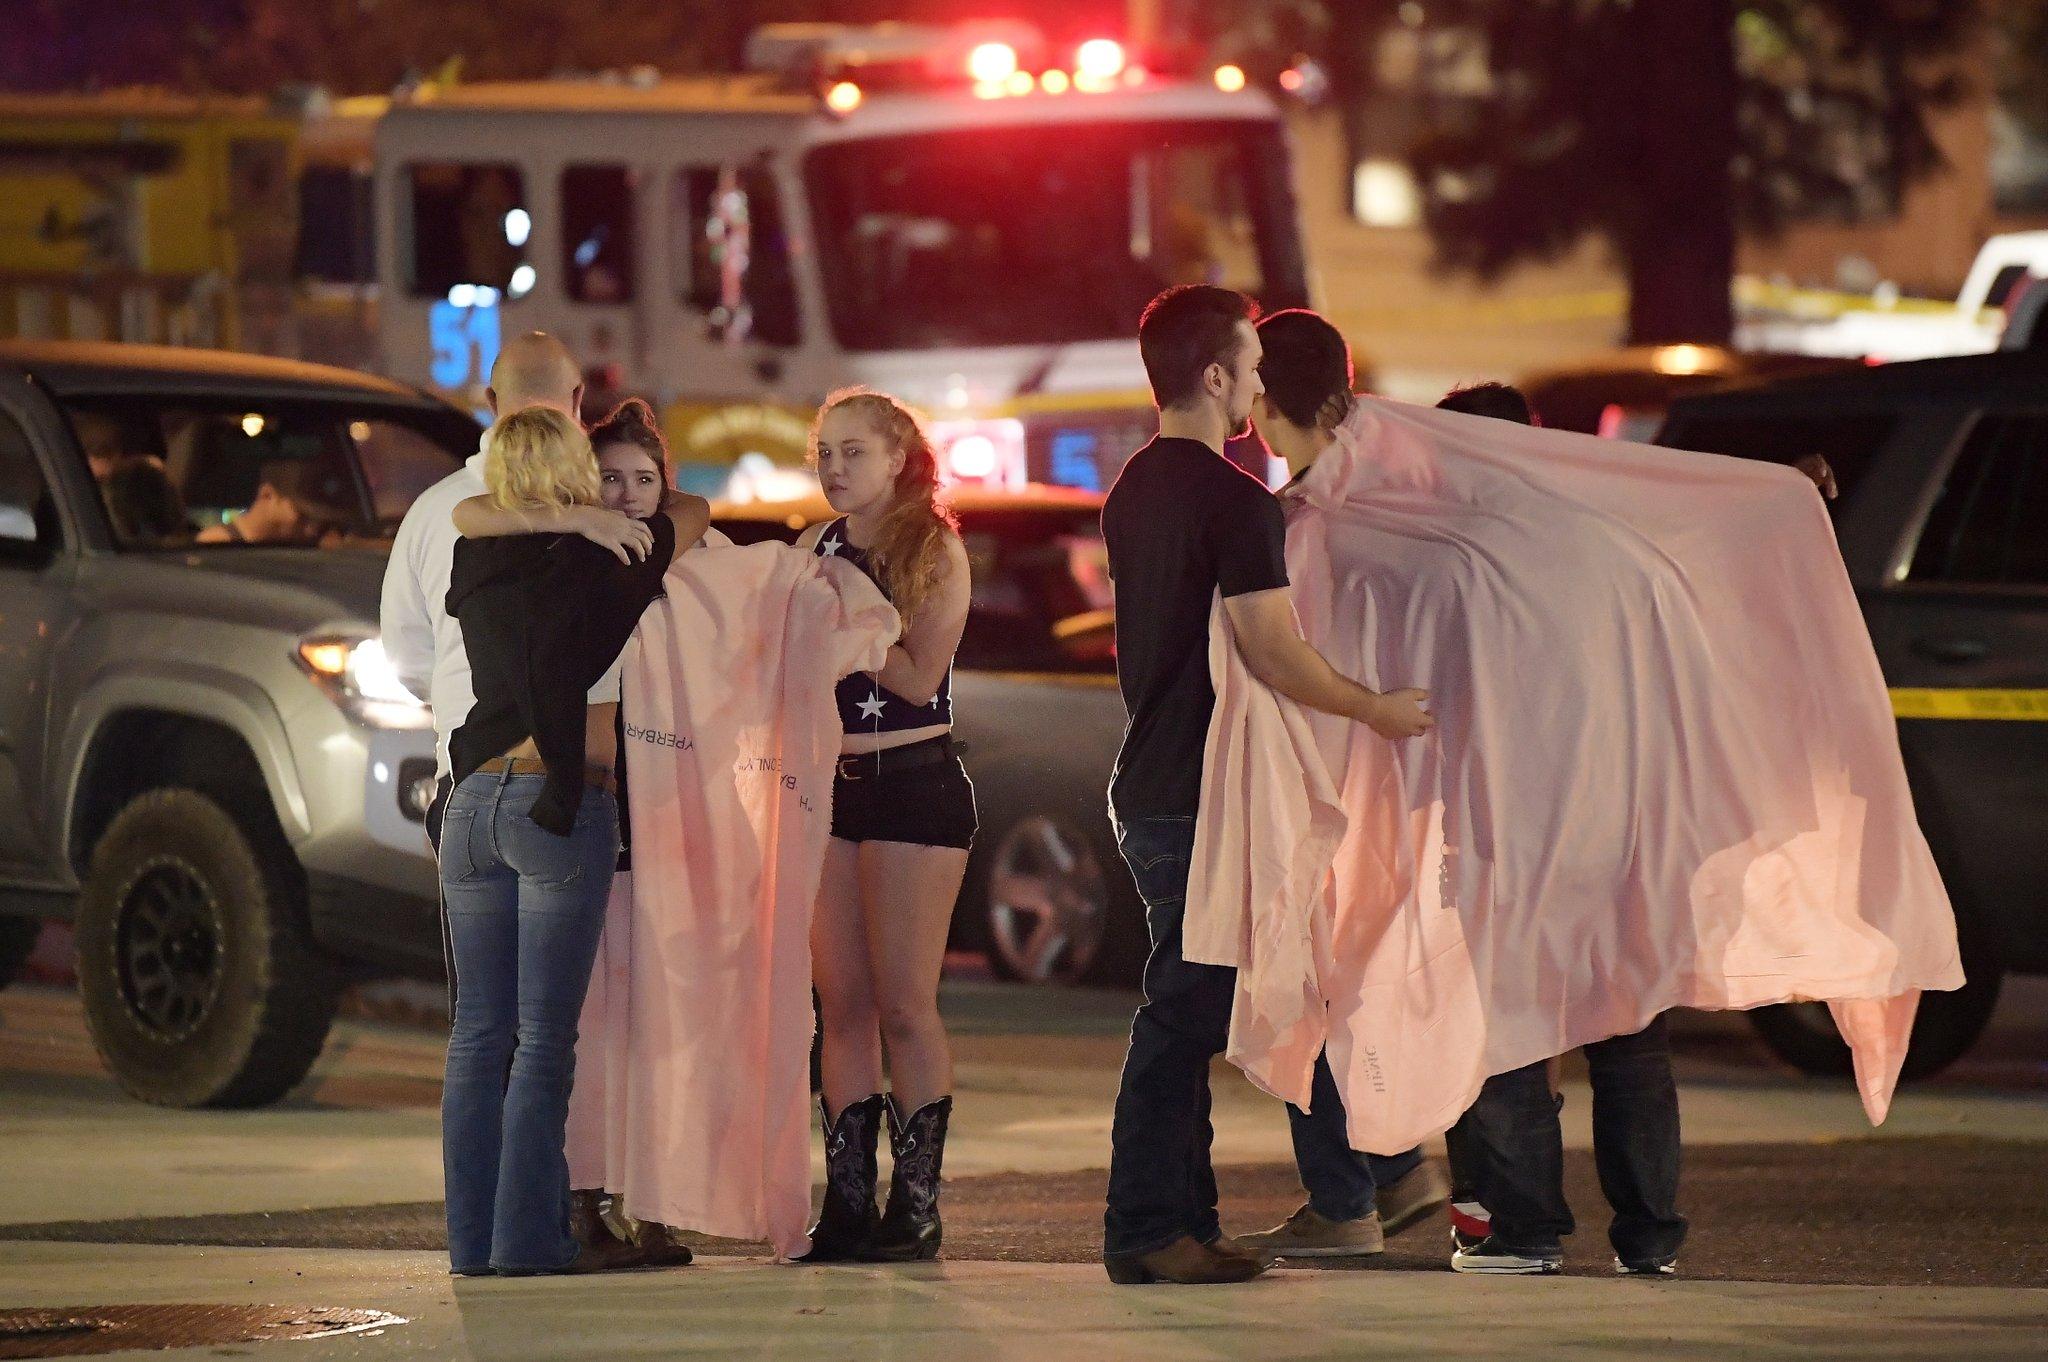 12 killed in California bar shooting